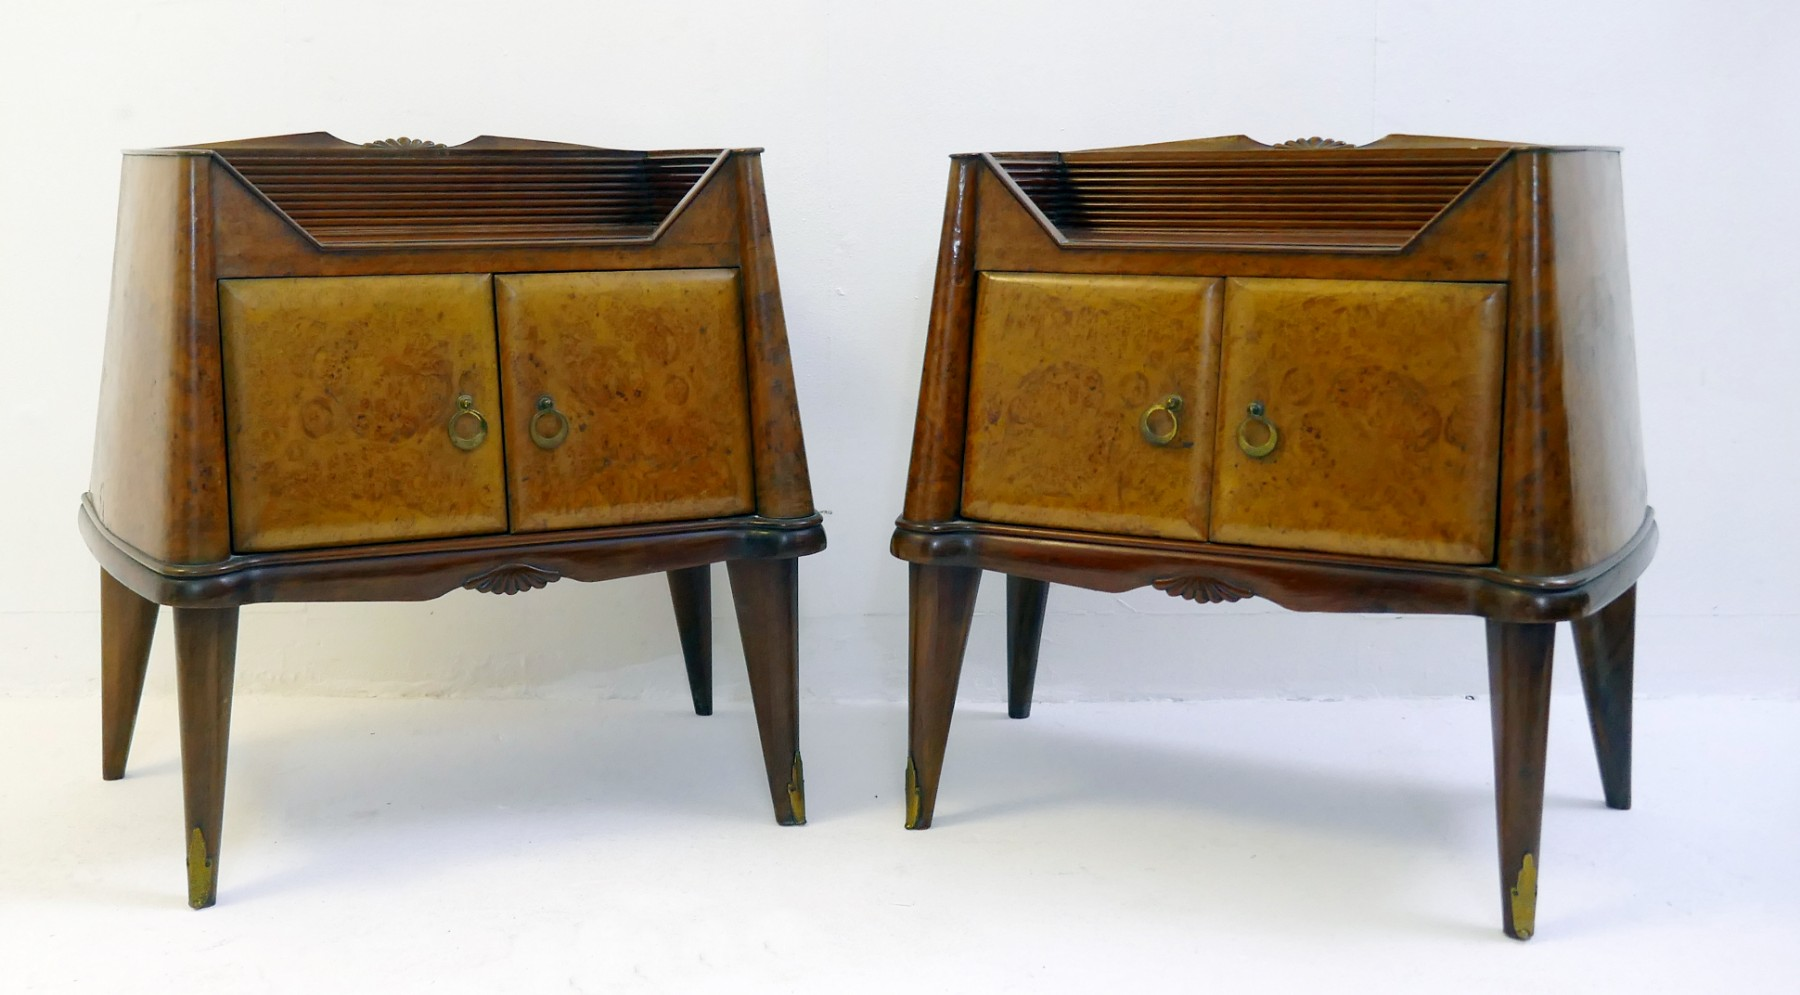 Pair Of Italian Art Deco Bedside Tables Jugendstil Items By